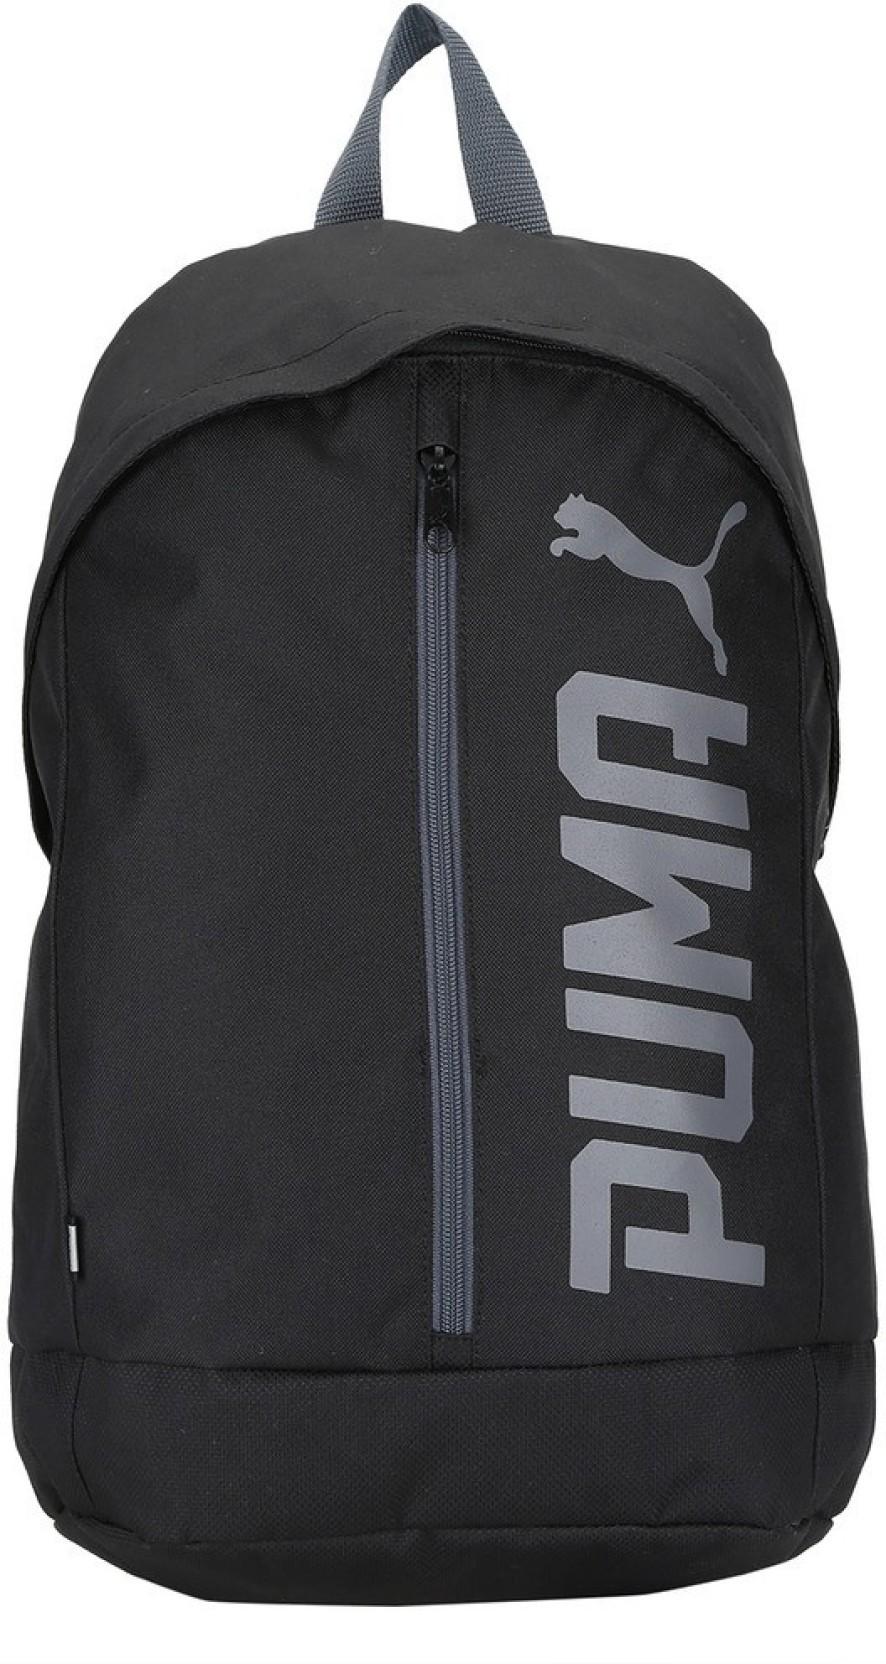 6ef4450f78f Puma Pioneer Backpack II 17.5 L Laptop Backpack Puma Black - Price ...